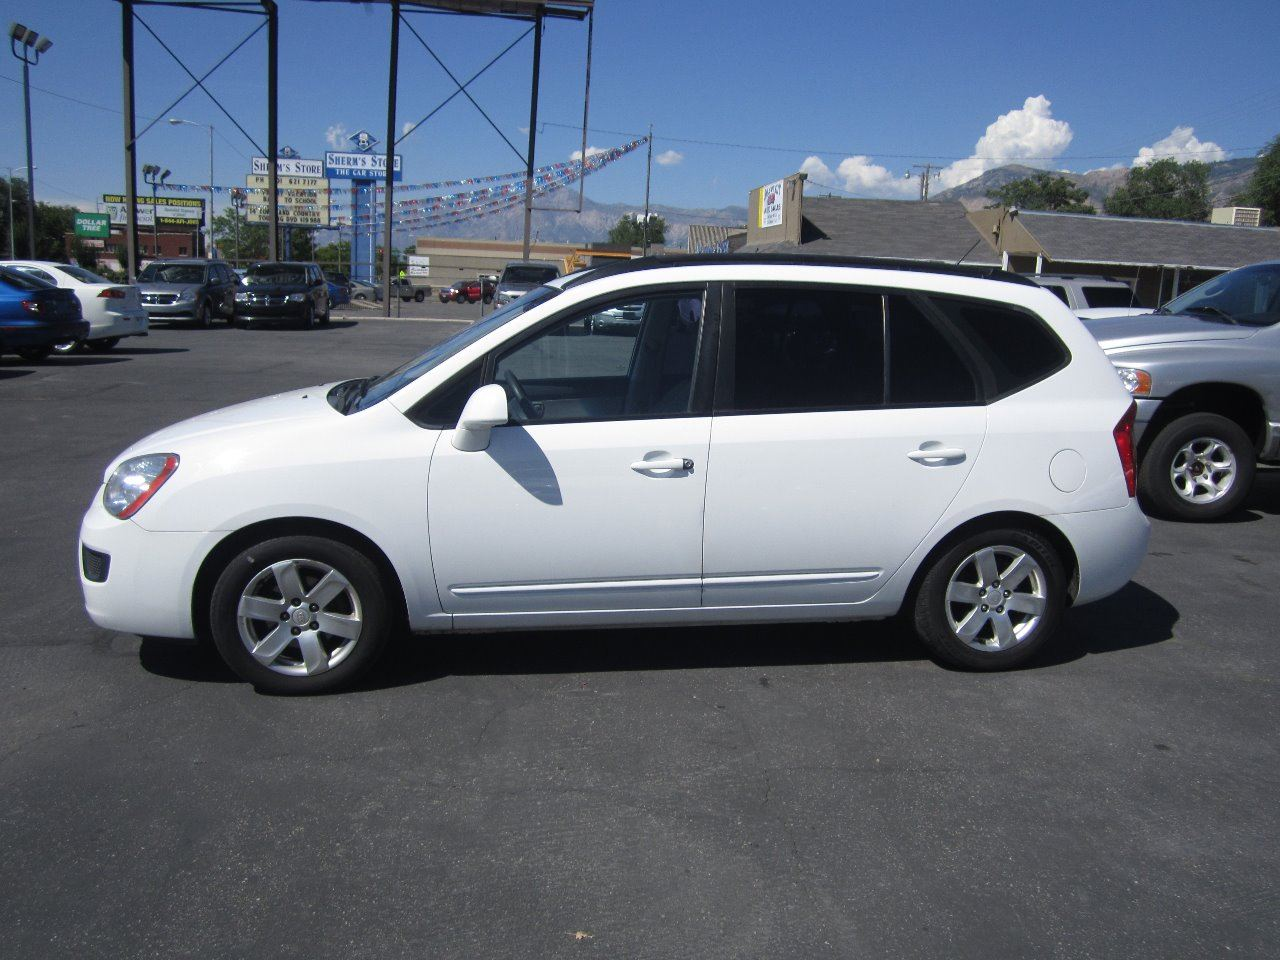 2008 Kia Rondo for sale at Smart Buy Auto Sales in Ogden UT